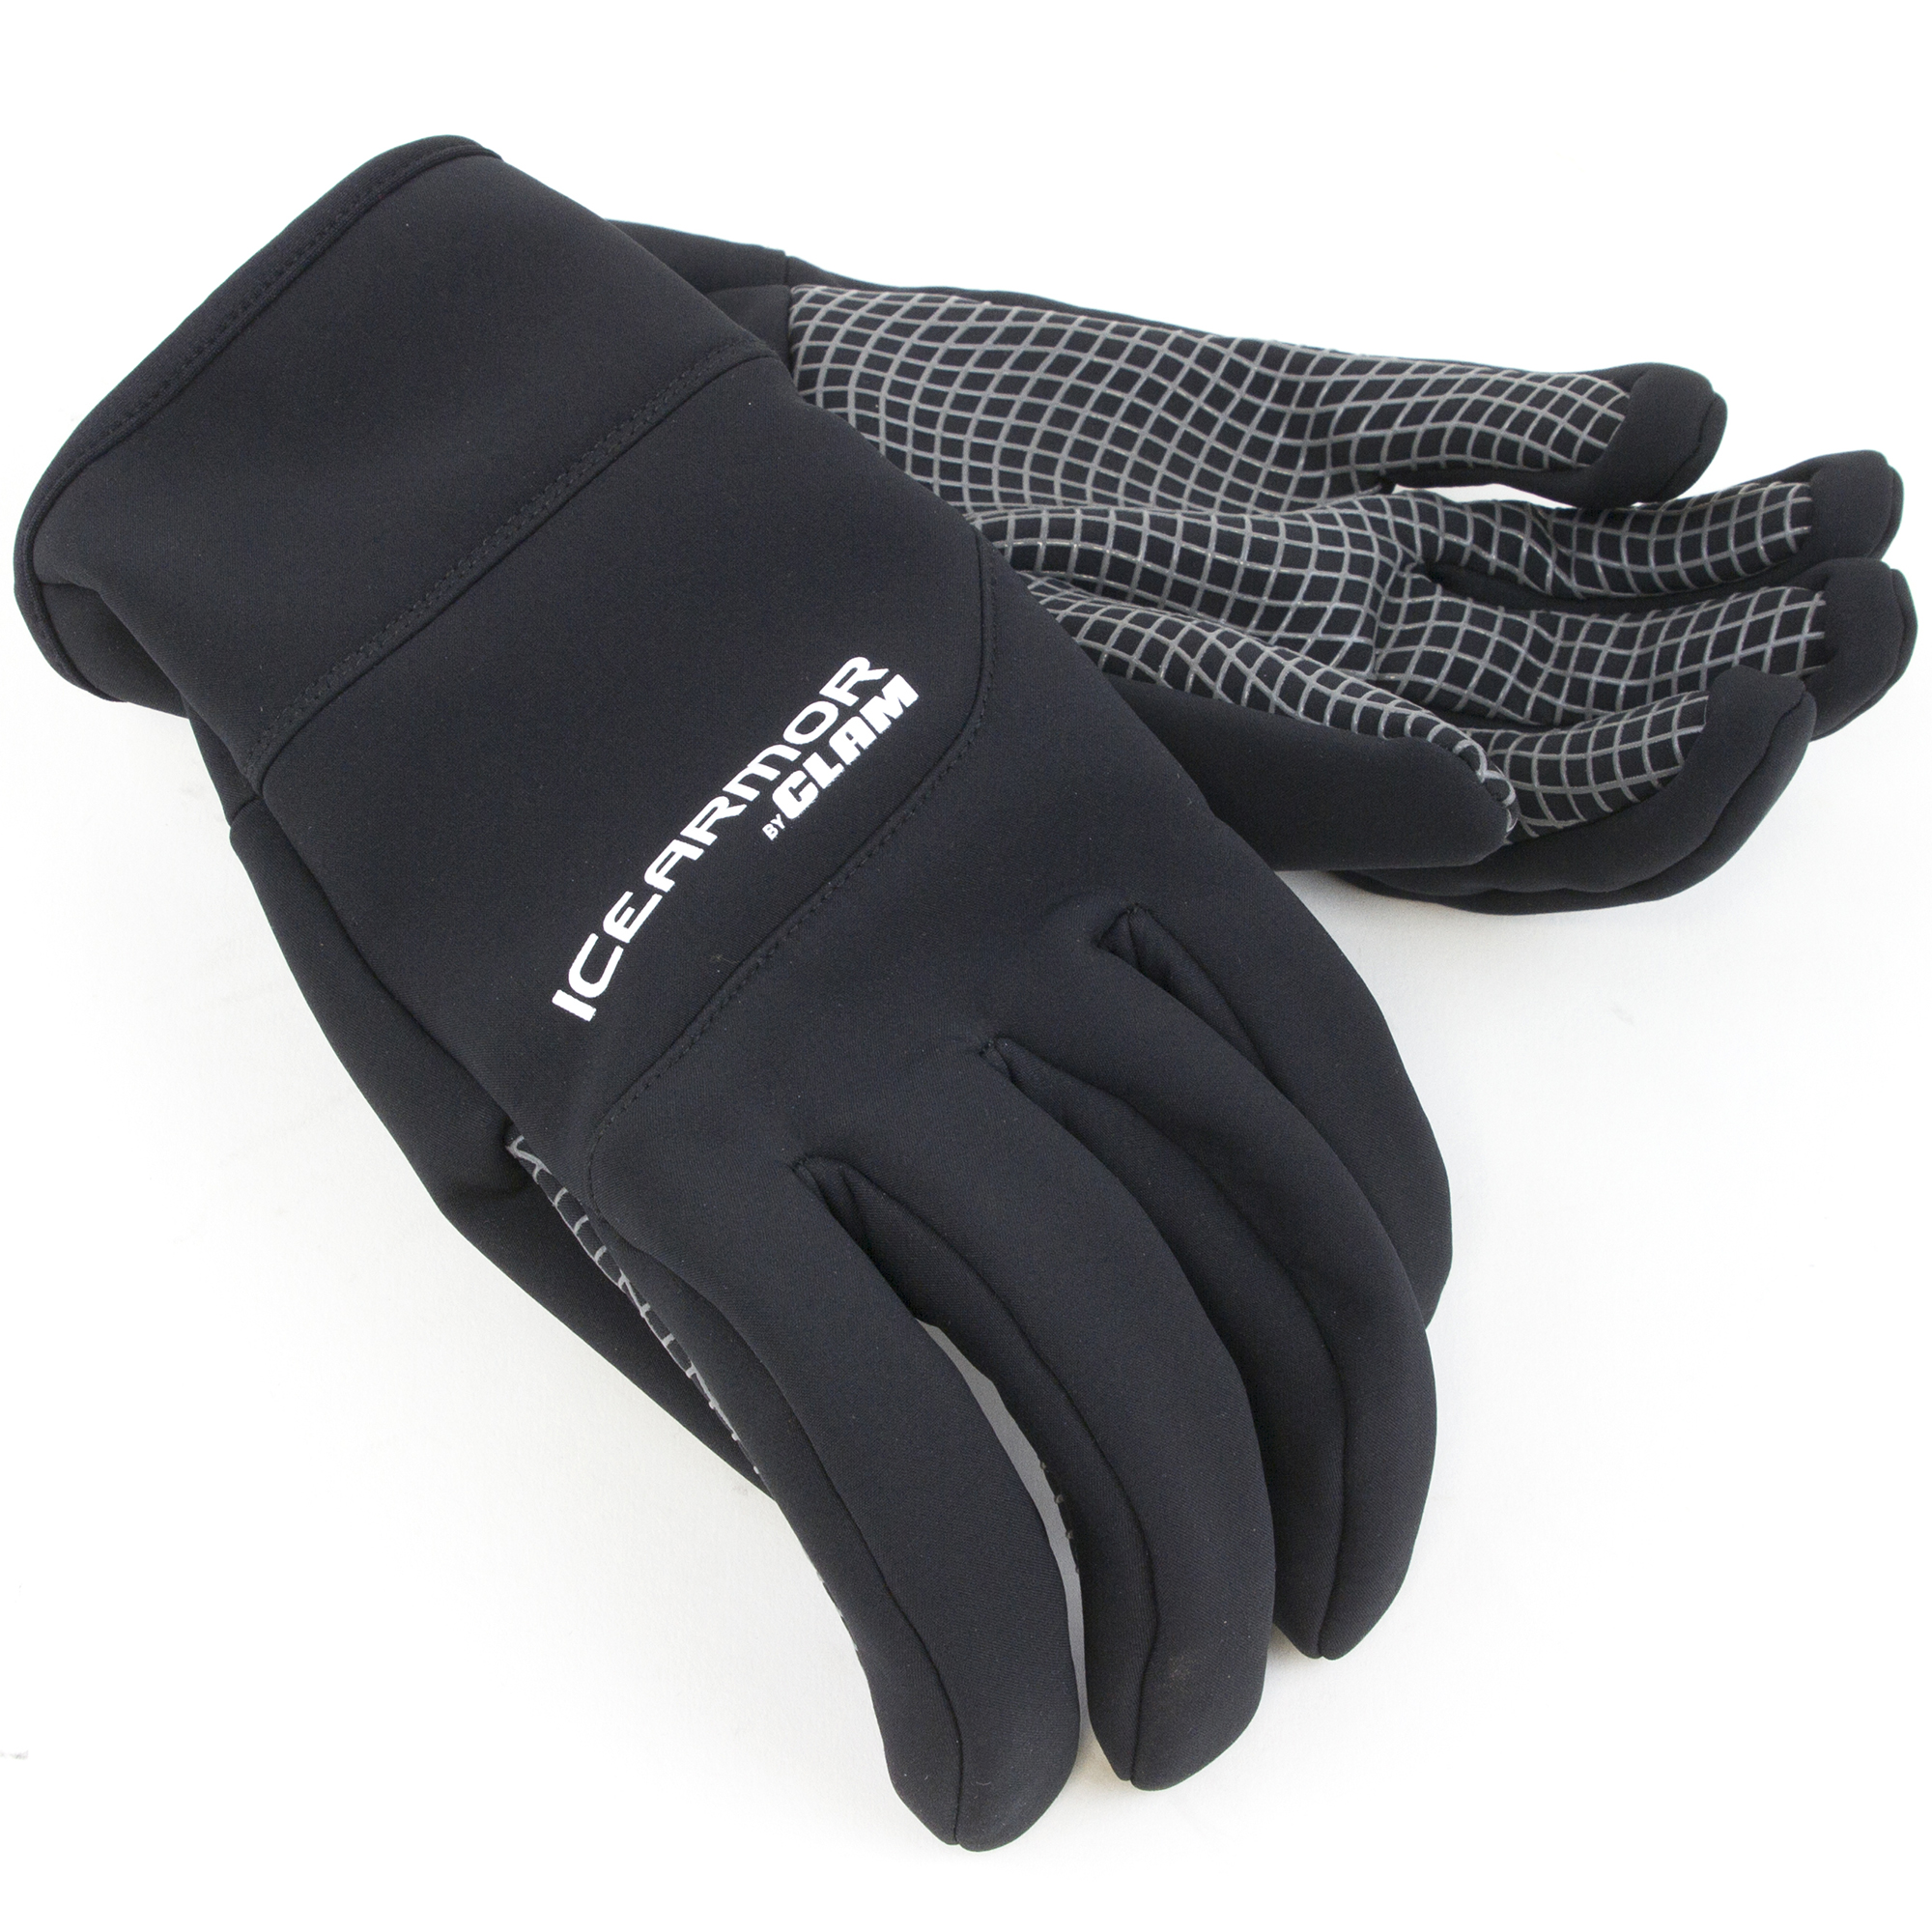 Clam Men's Ice Armor Link Softshell Glove